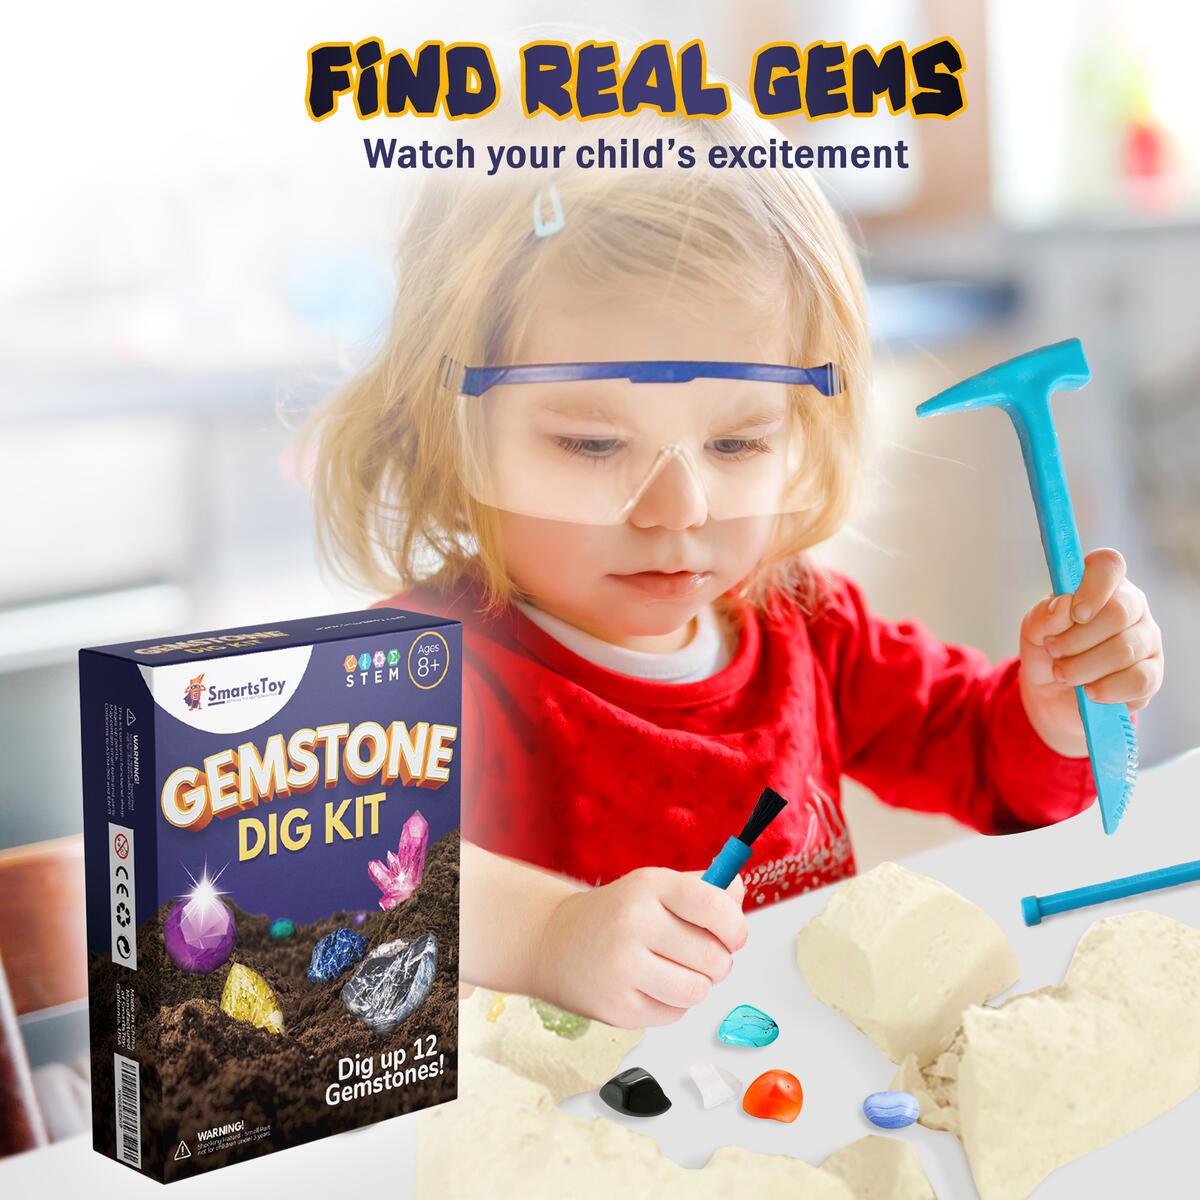 Kids activity- Gemstone did kit